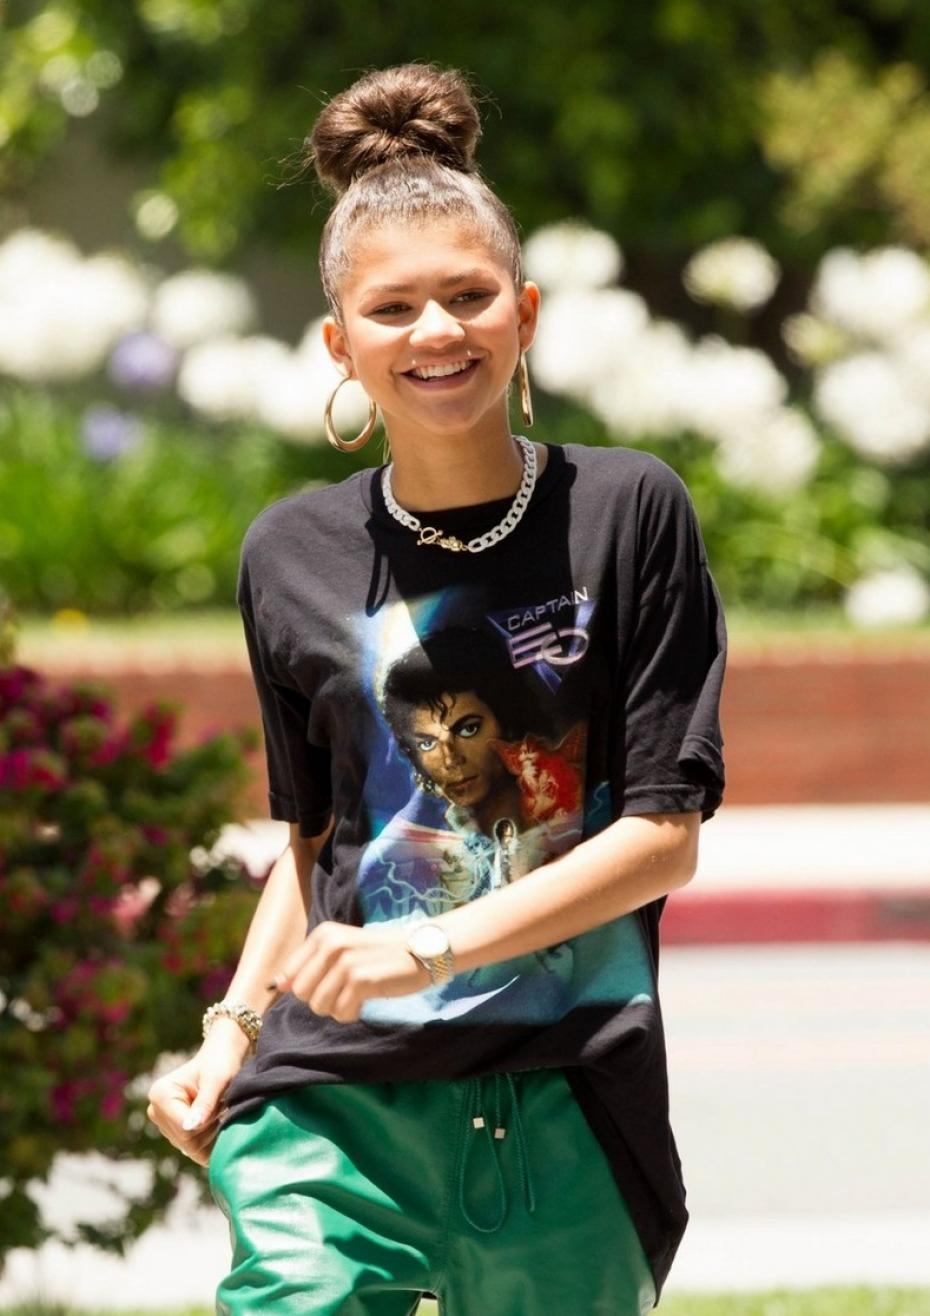 zendaya coleman wears a कमीज, शर्ट of michael jackson